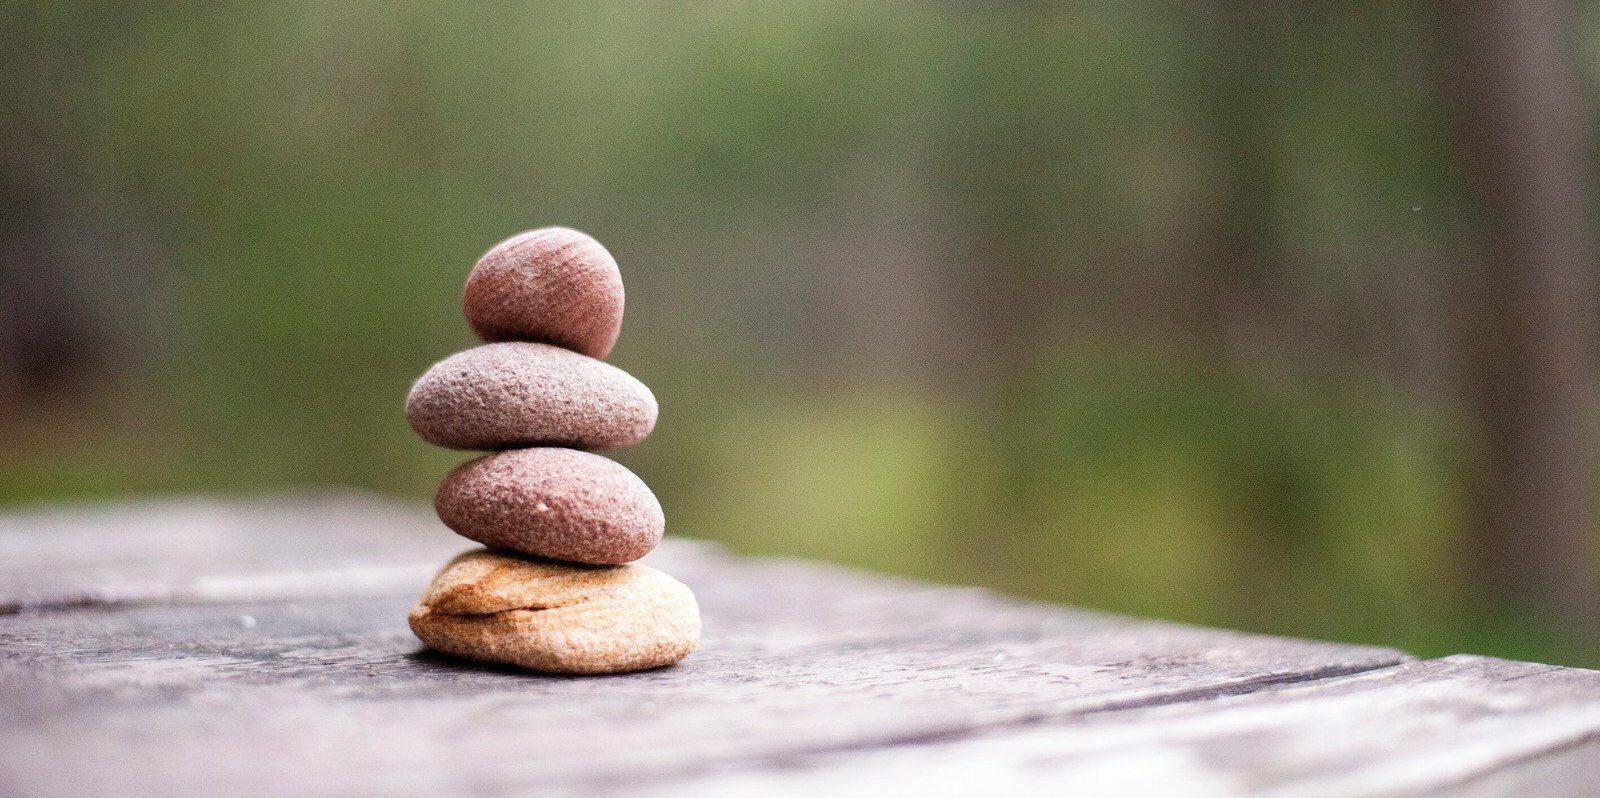 balanced rock pile